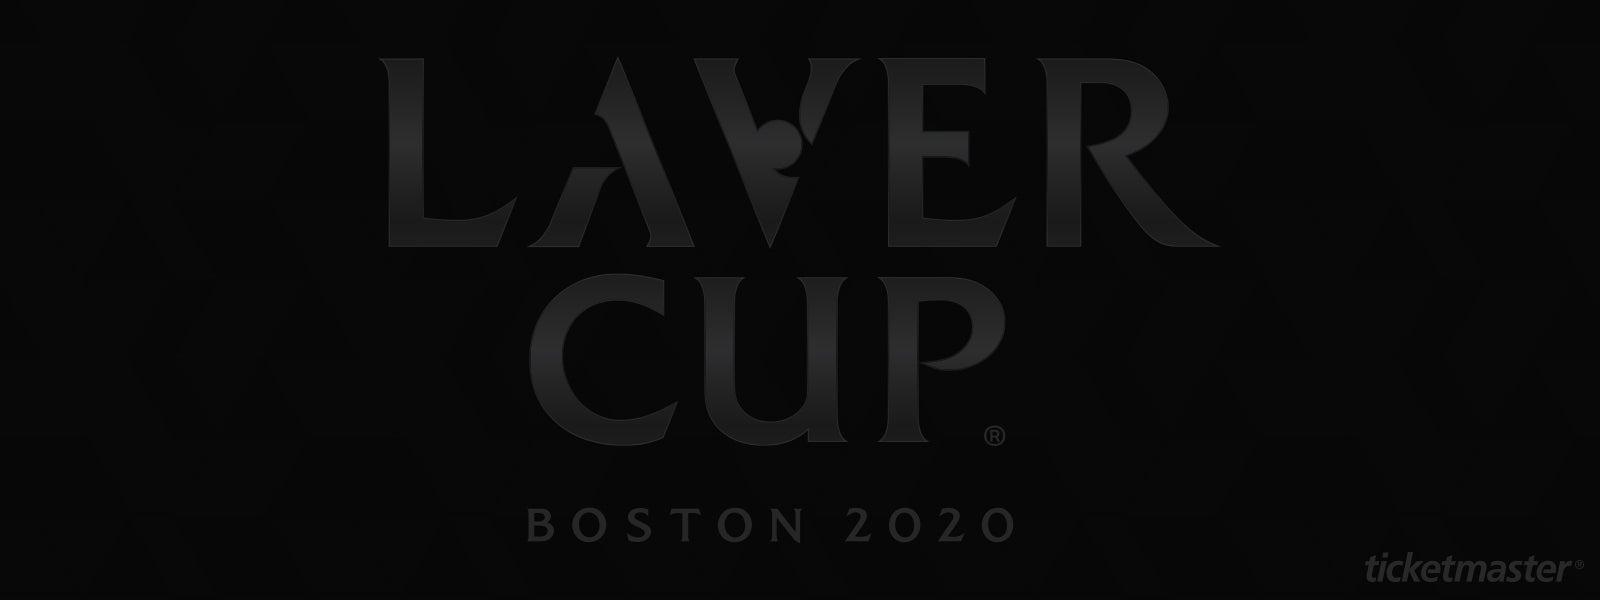 Laver Cup - Postponed